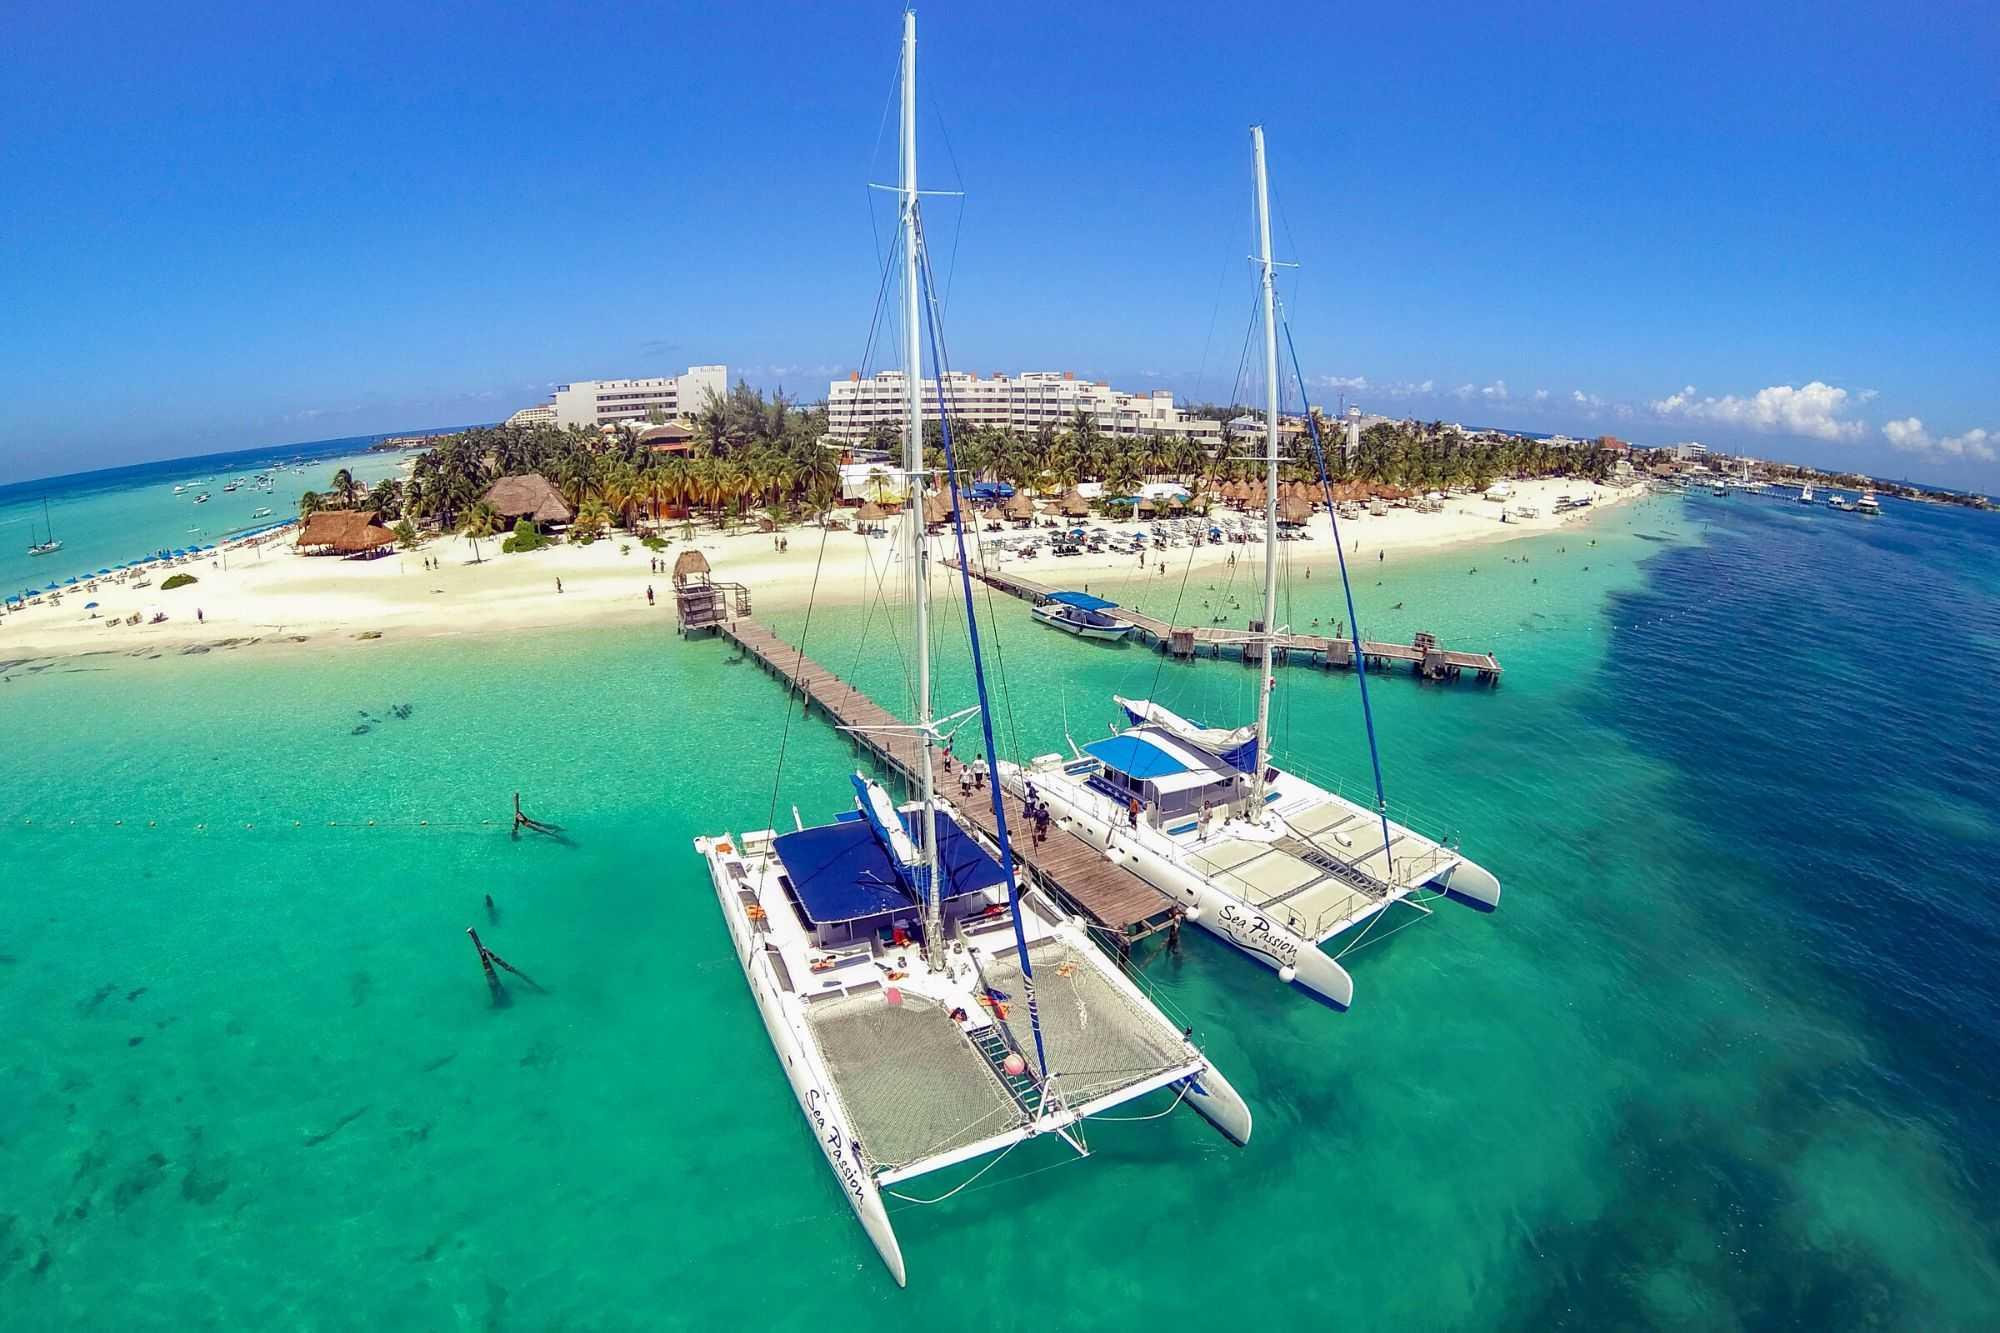 3 Private Isla Mujeres tour in catamaran - Sea Passion I II - Cancun Sailing